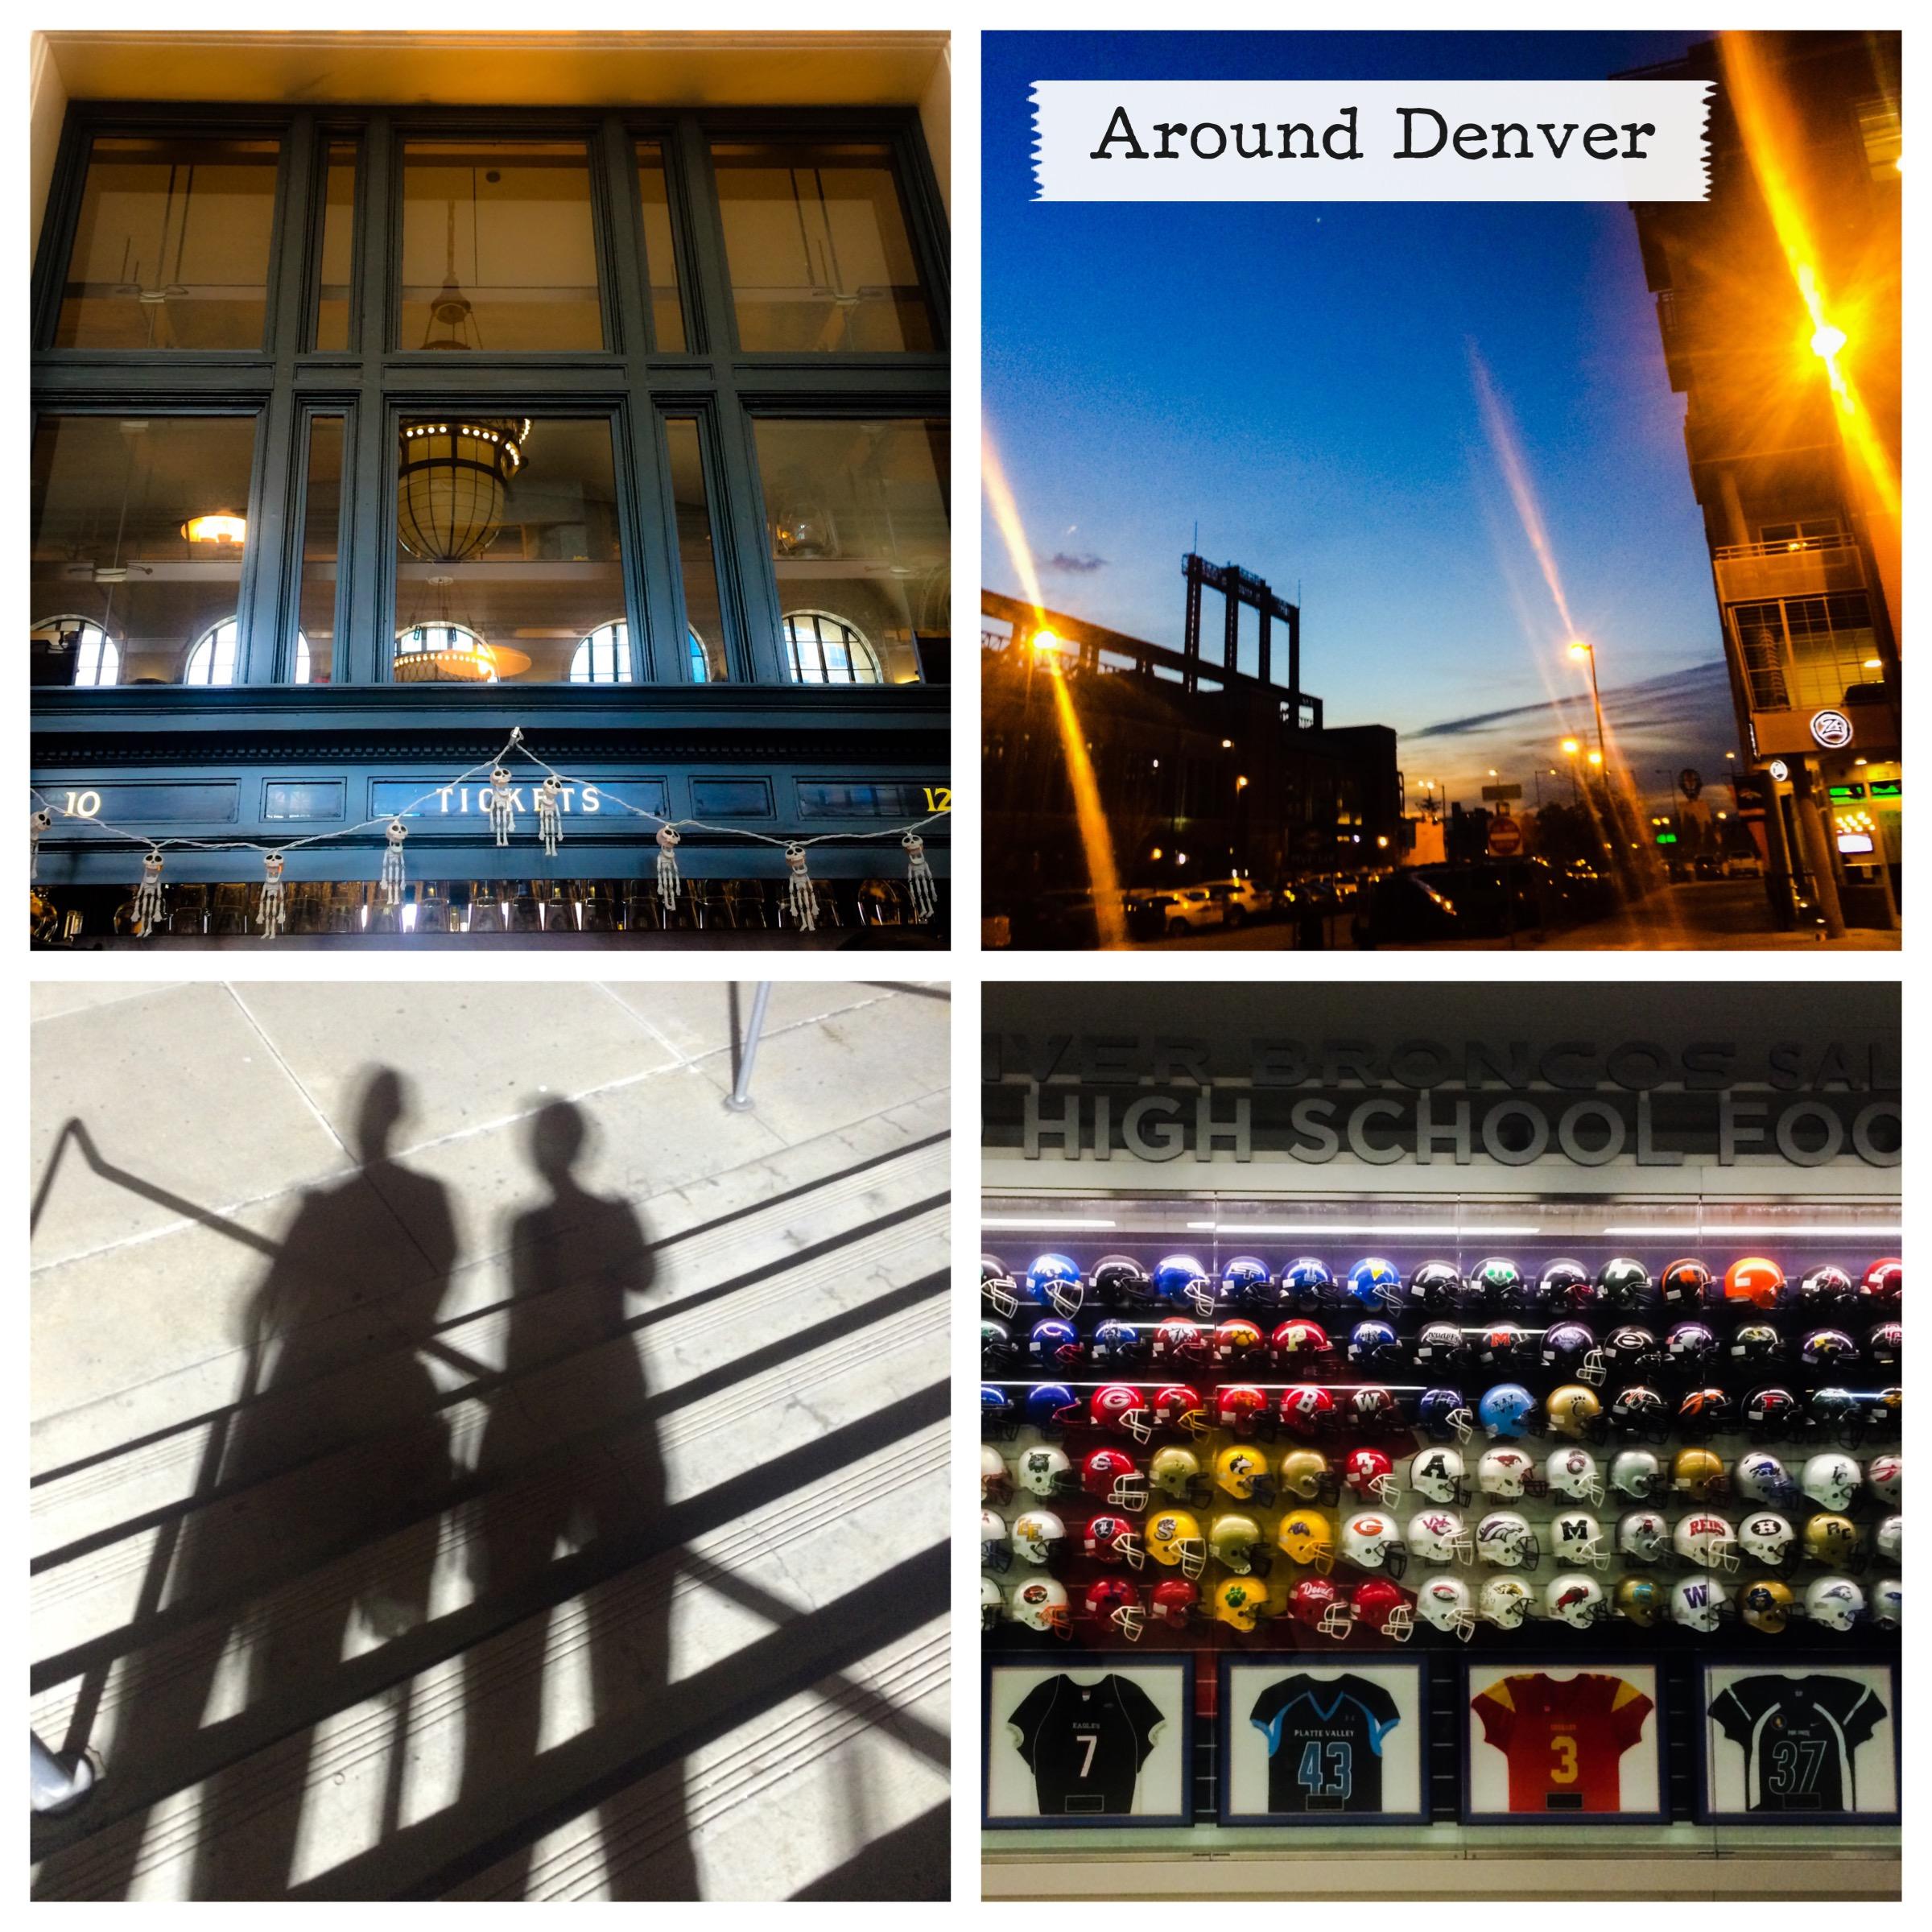 Around Denver